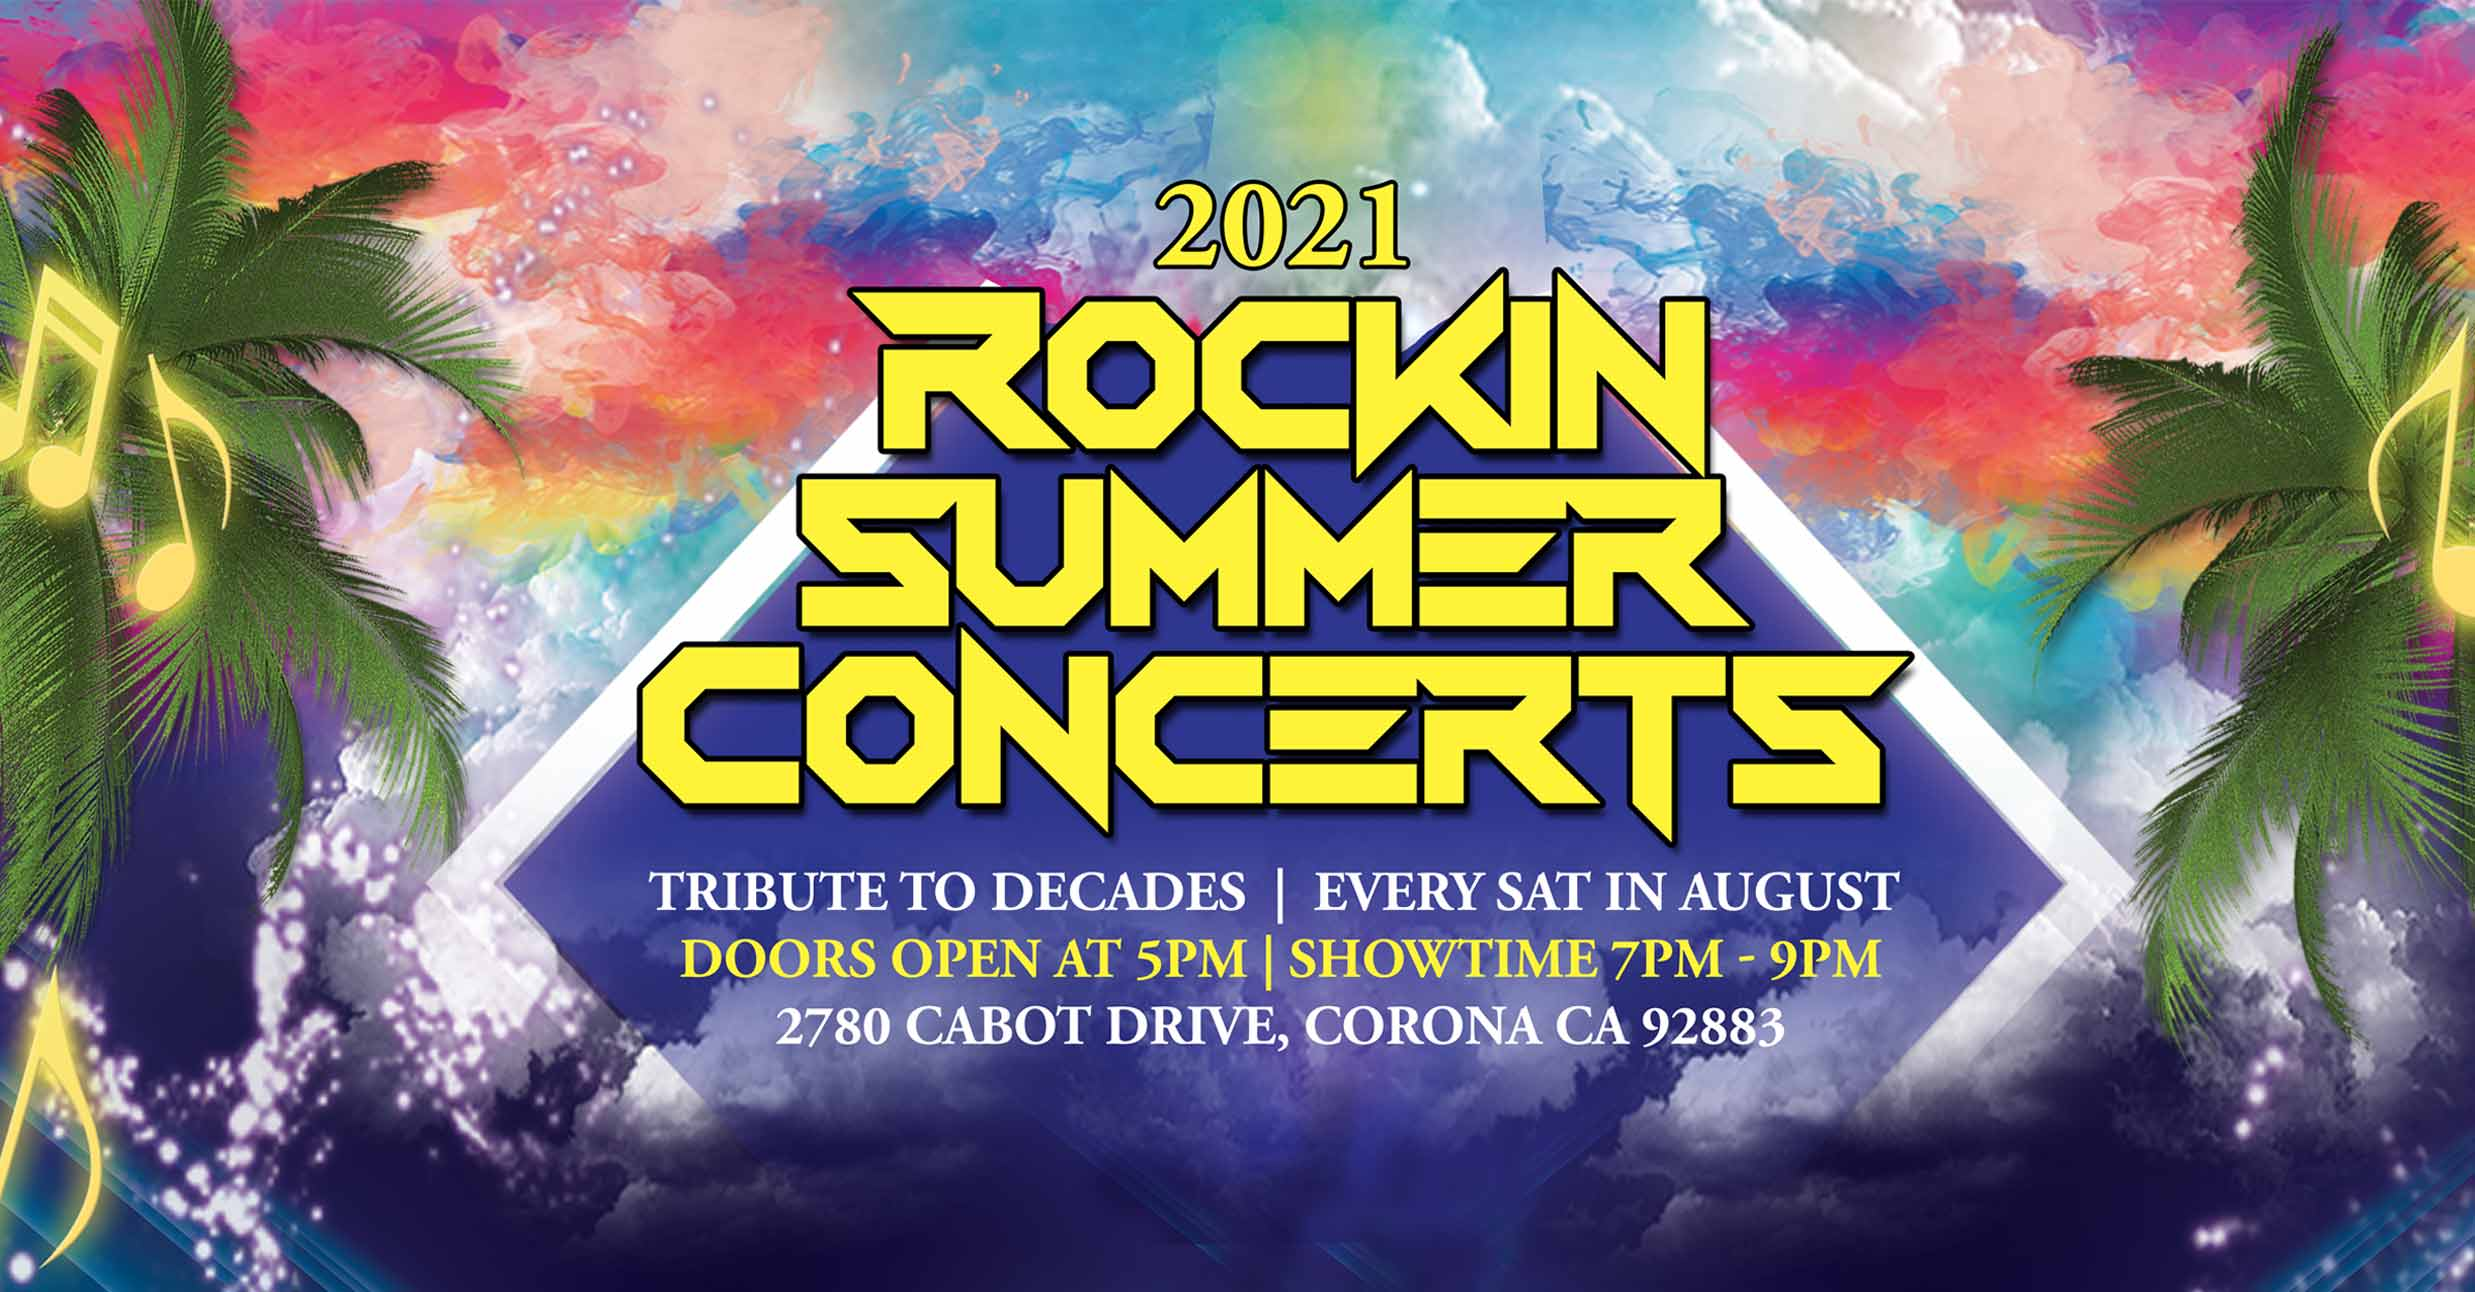 2021 Rockin Summer Concerts – Save The Dates!